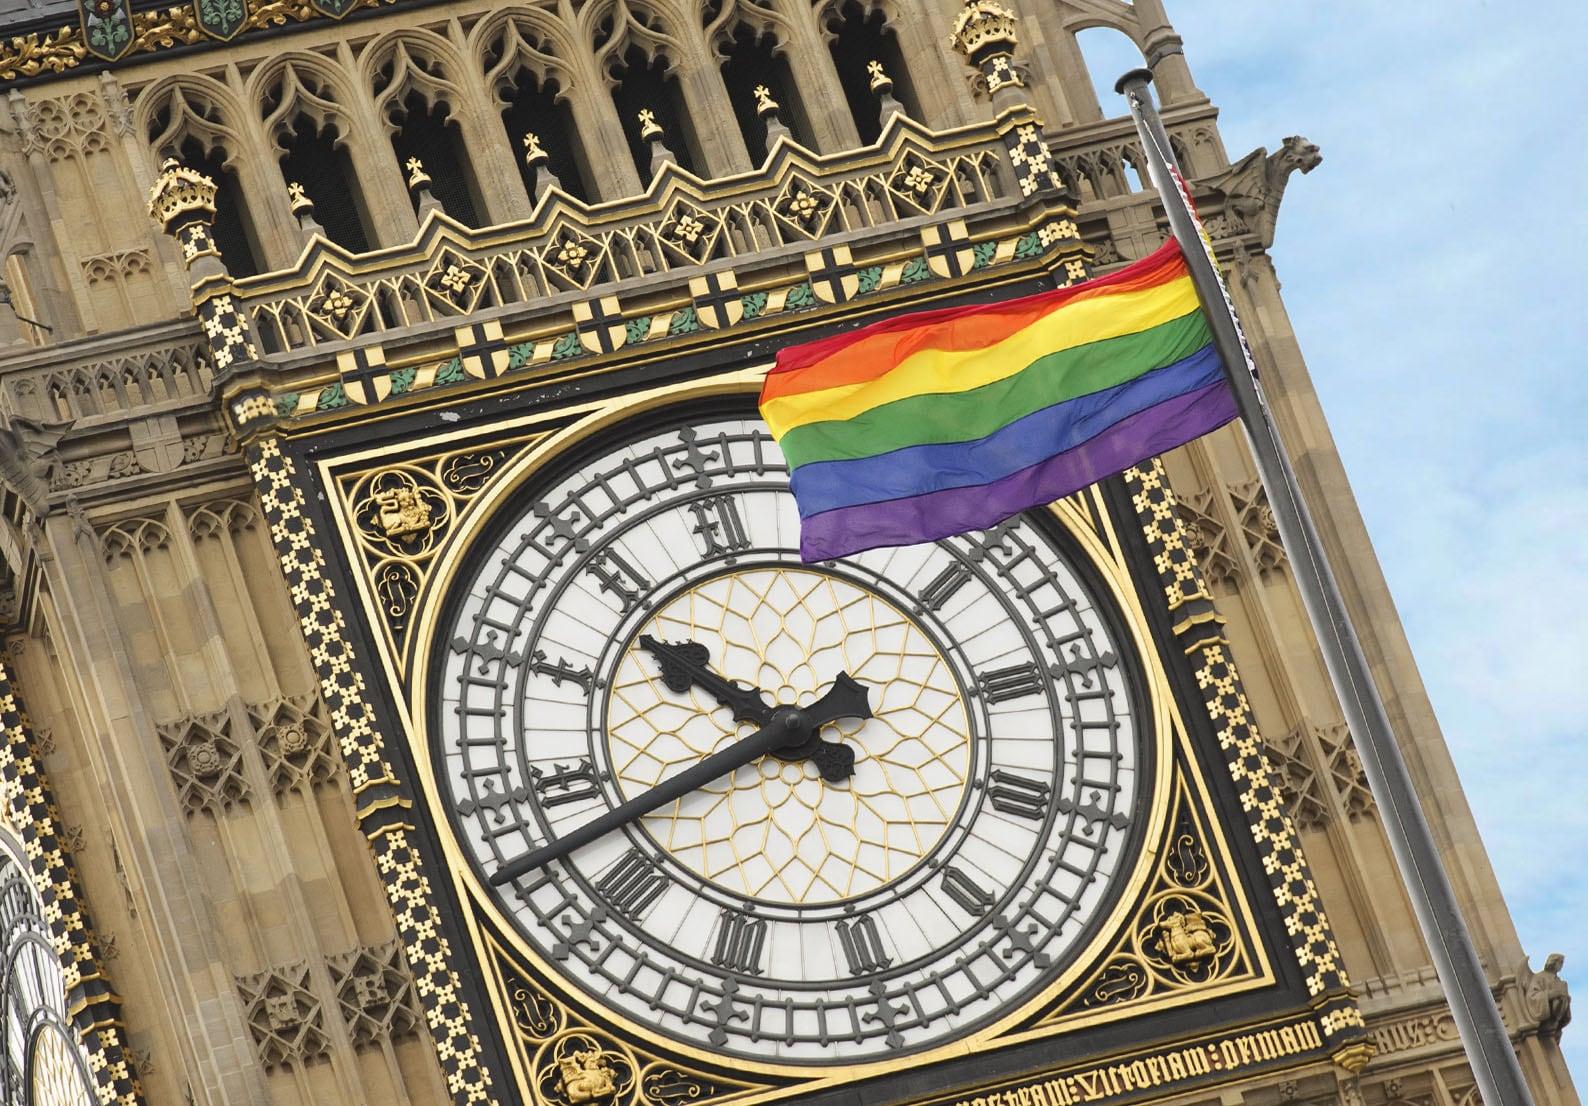 sightseeing highlights of London Pride at Parliament